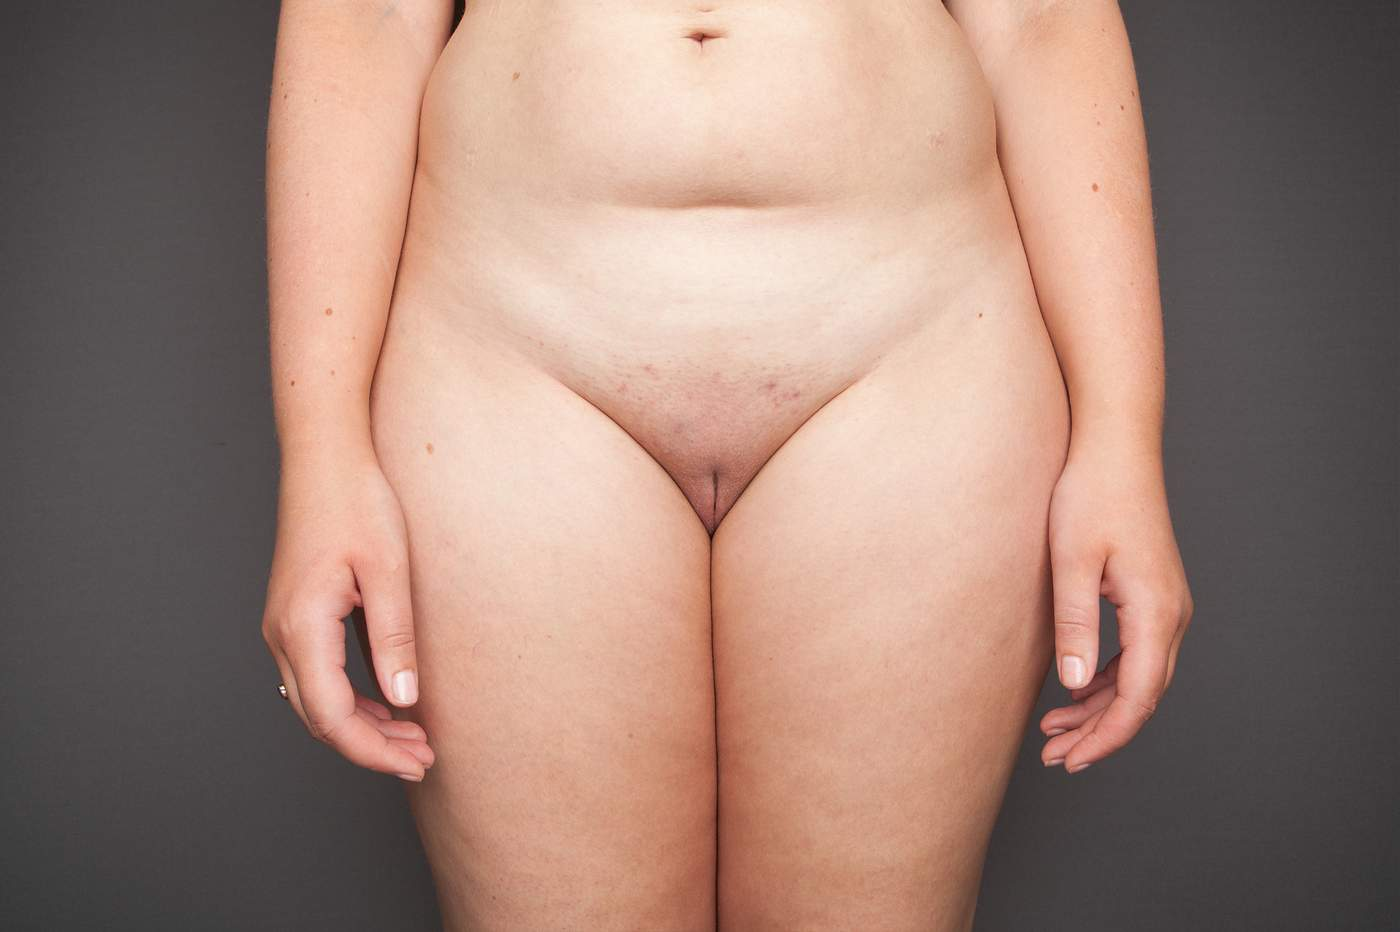 Laura Dodsworth Why I Photographed 100 Vulvas - Bbc News-3834